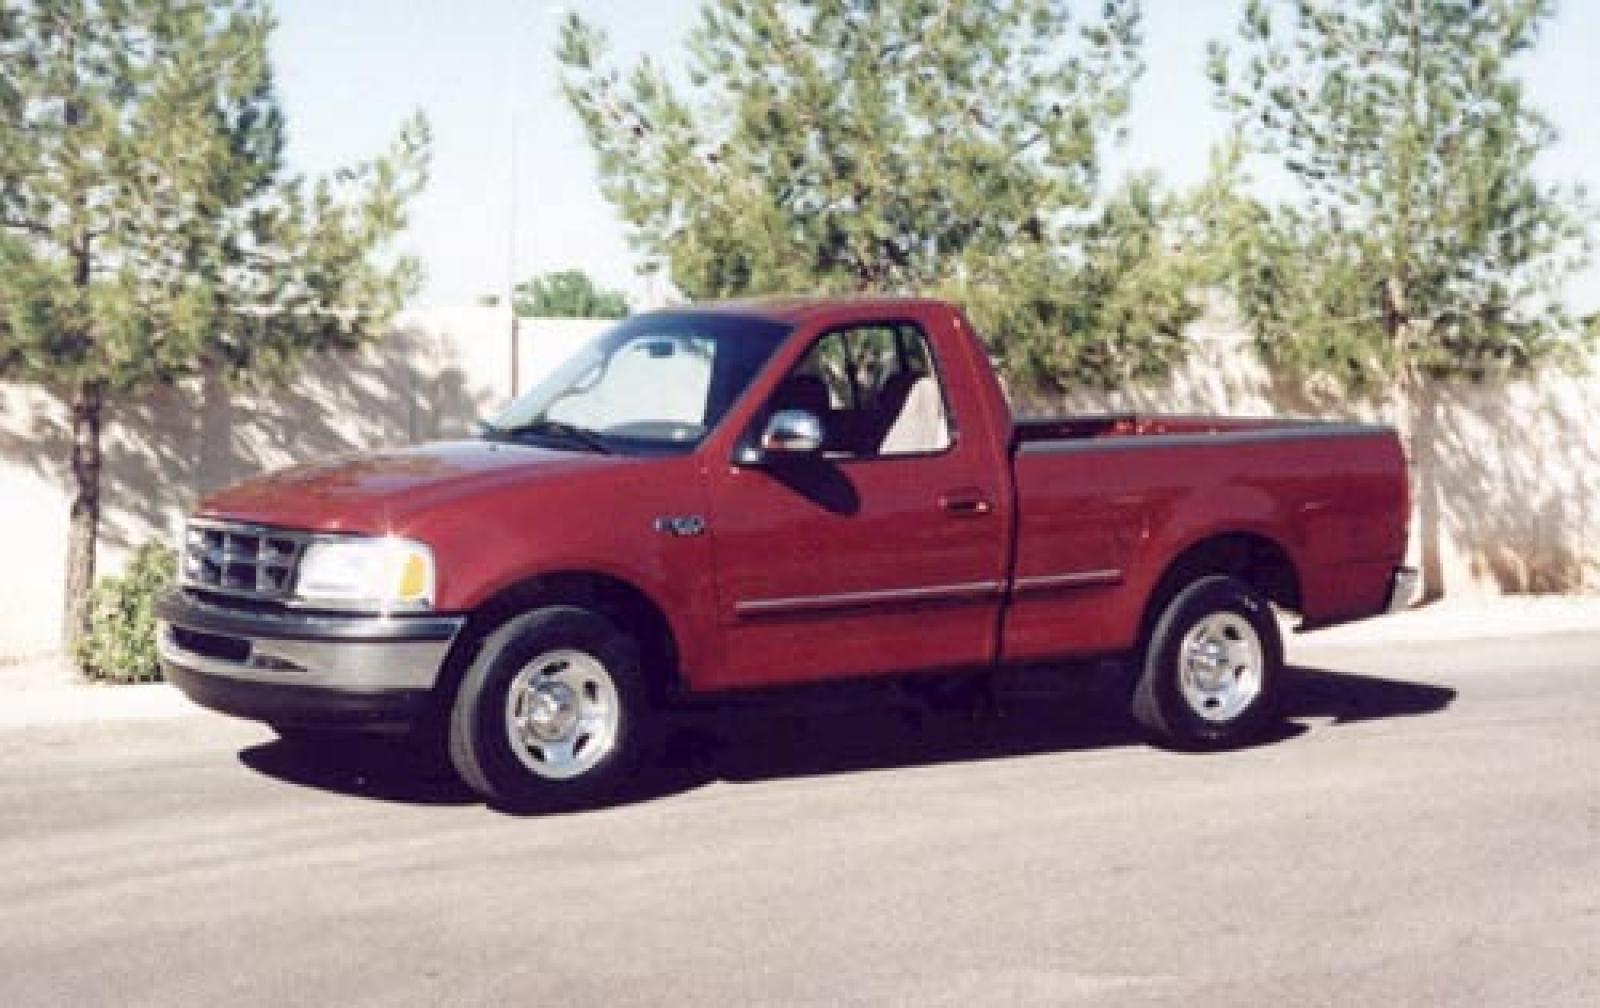 1997 ford f 150 1 800 1024 1280 1600 origin